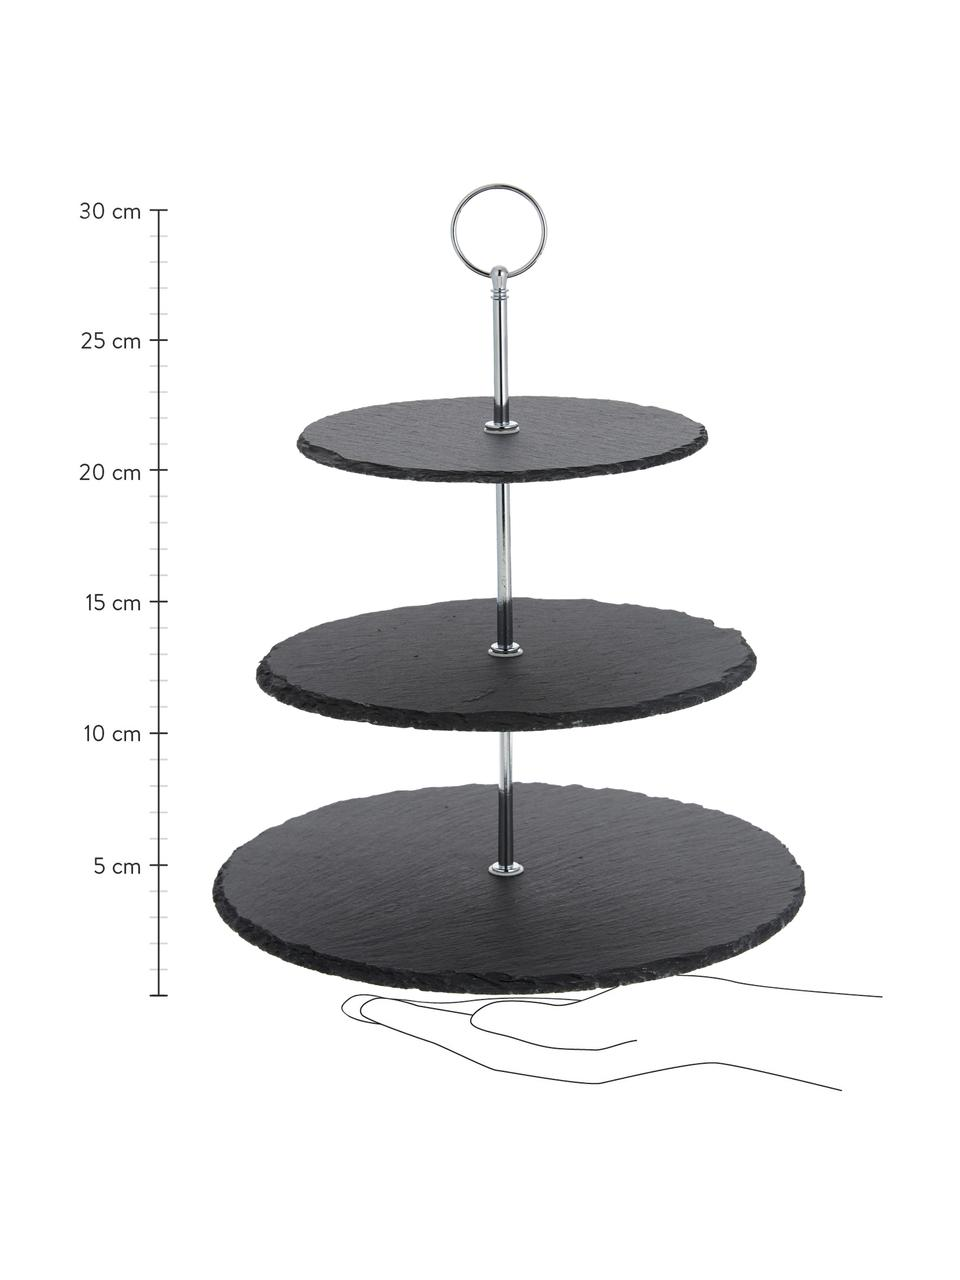 Etagère Cooper met leistenen plateaus, Ø 30 cm, Plateaus: leisteen, Frame: verchroomd metaal, Zwart, chroomkleurig, Ø 30 x H 31 cm